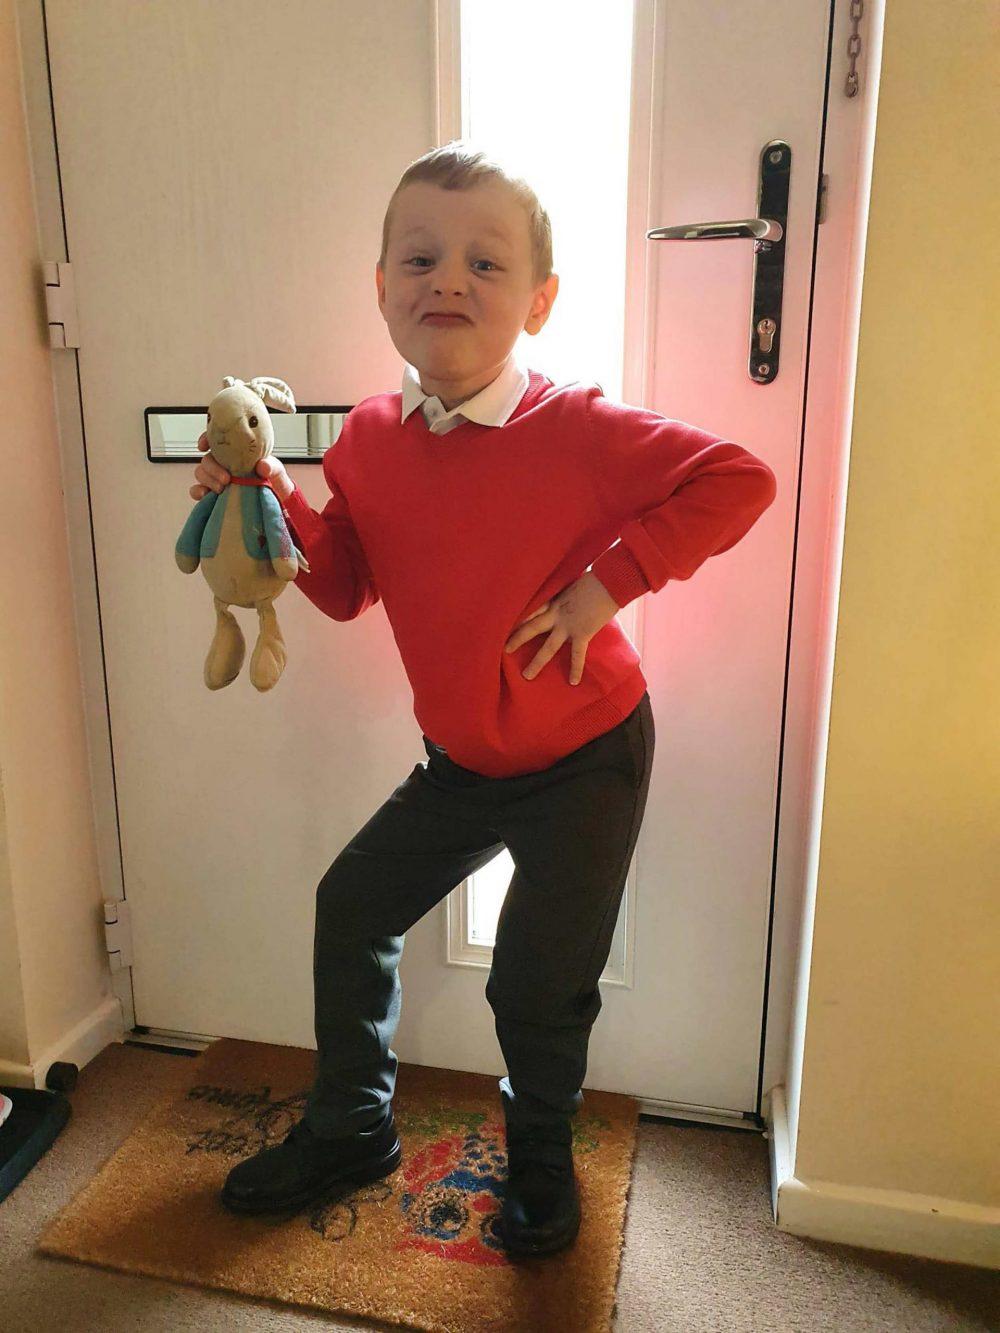 Ethan has had Peter since birth - UK News